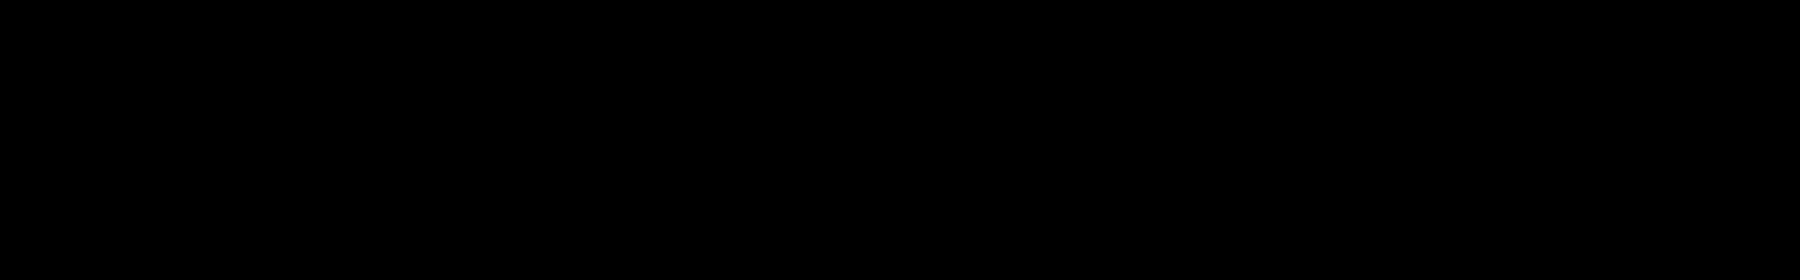 Cyborg Onslaught audio waveform